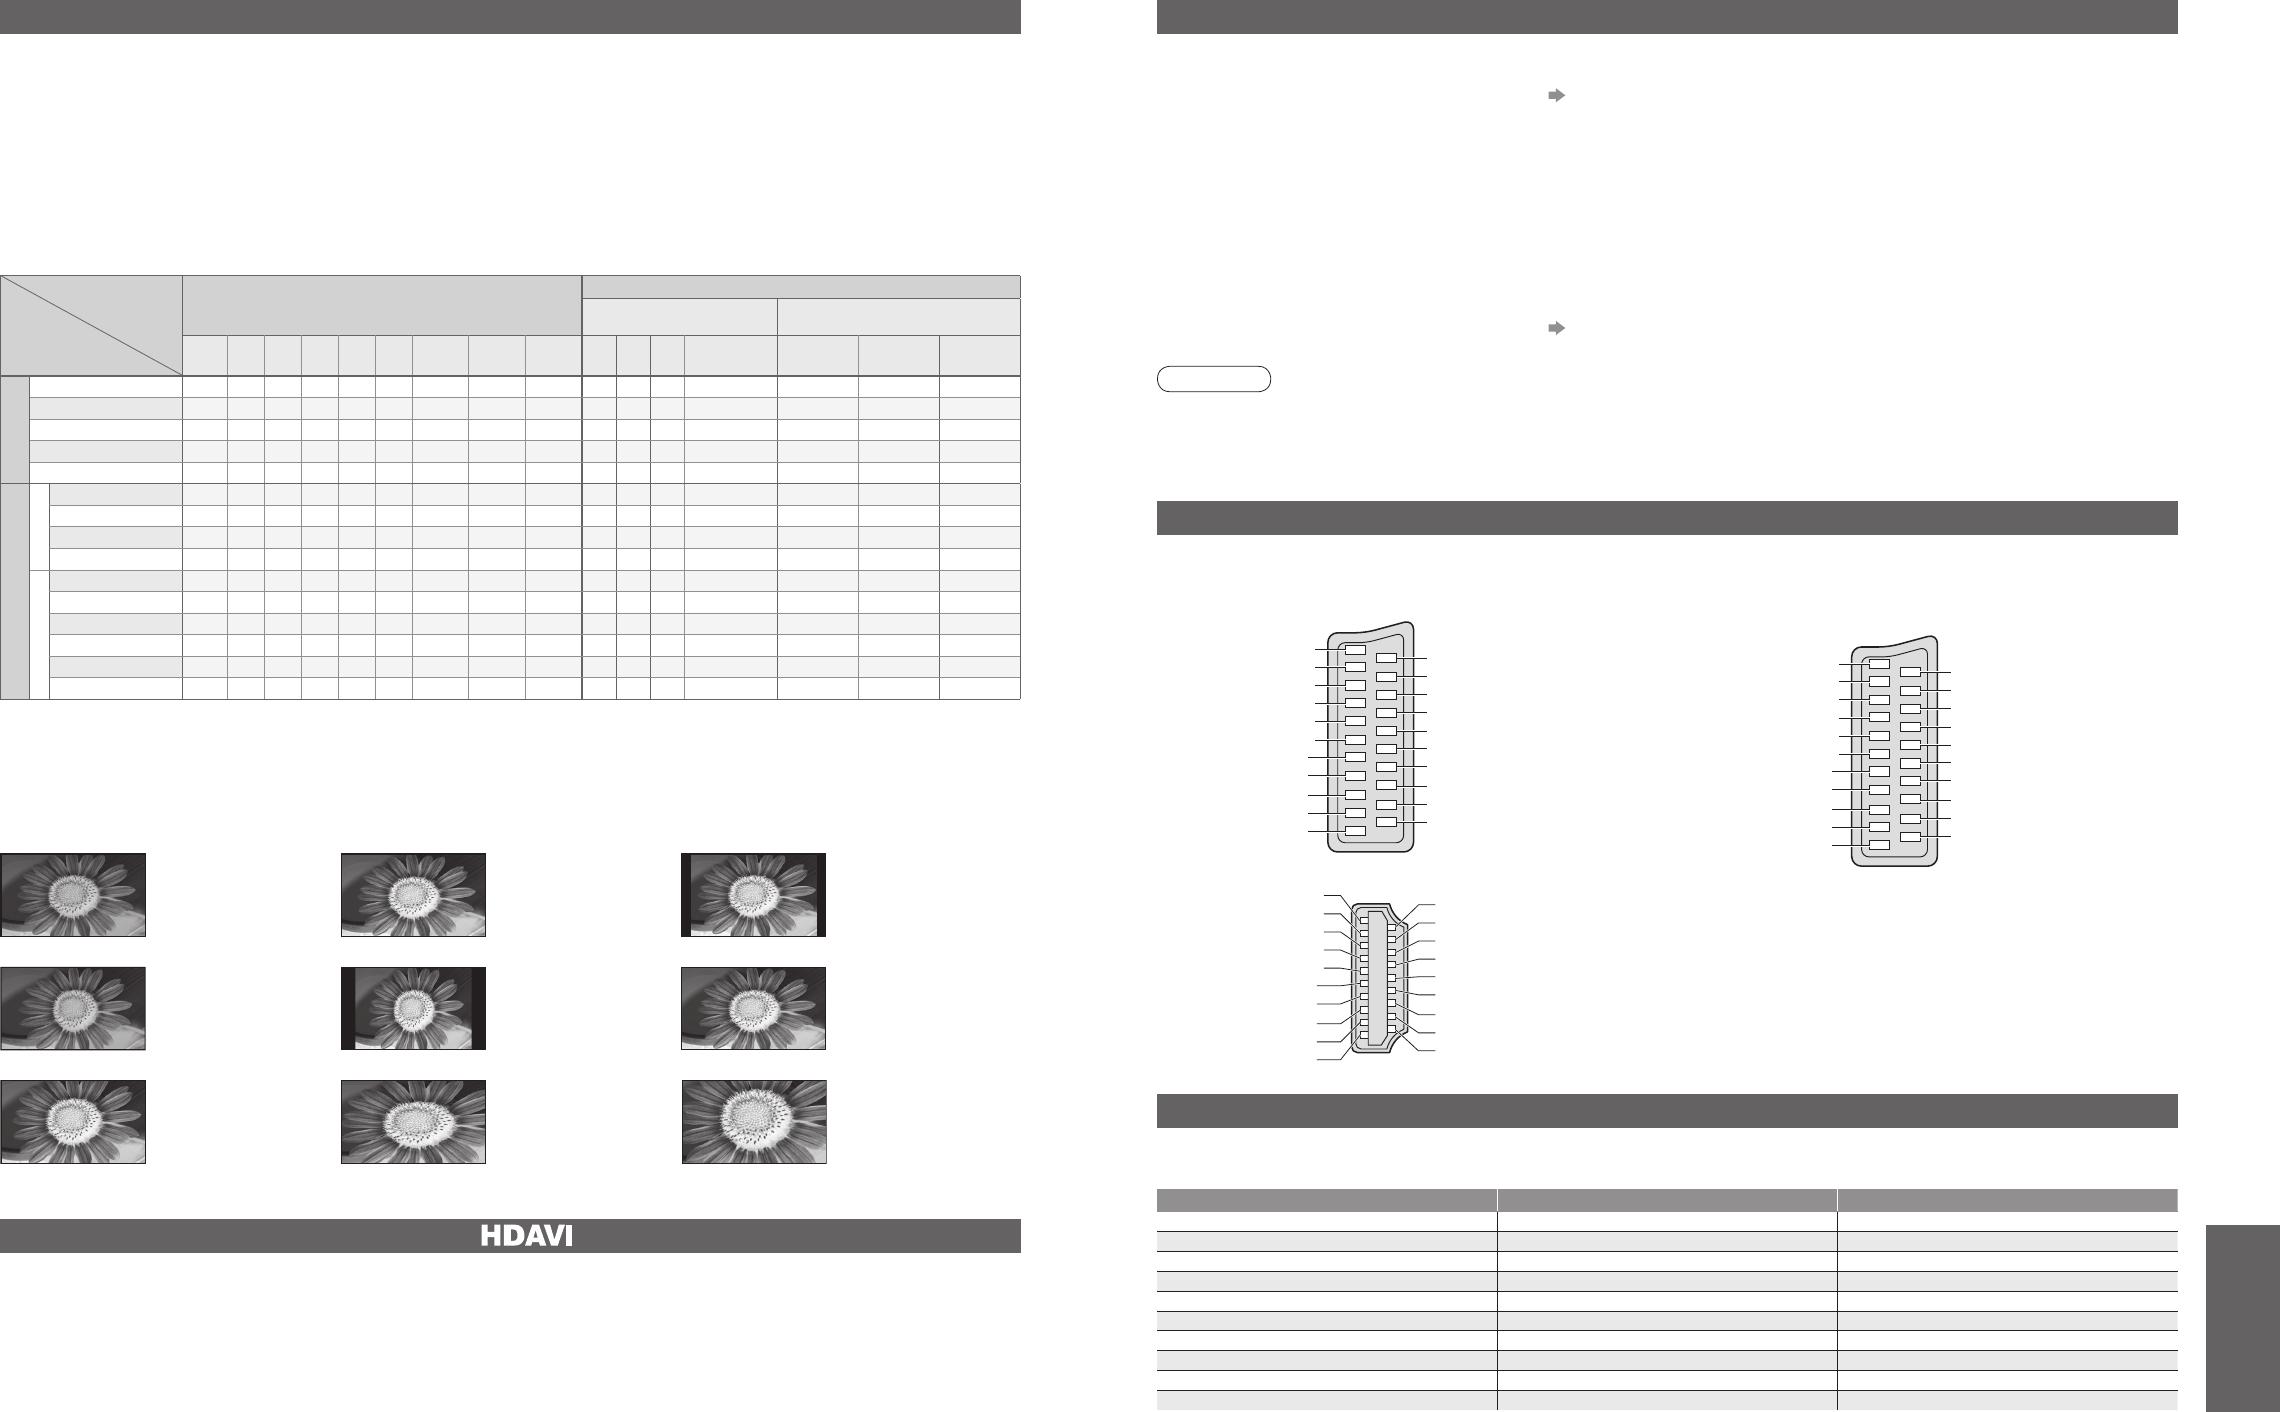 Handleiding Panasonic TH37PX7E (pagina 20 van 22) (English)